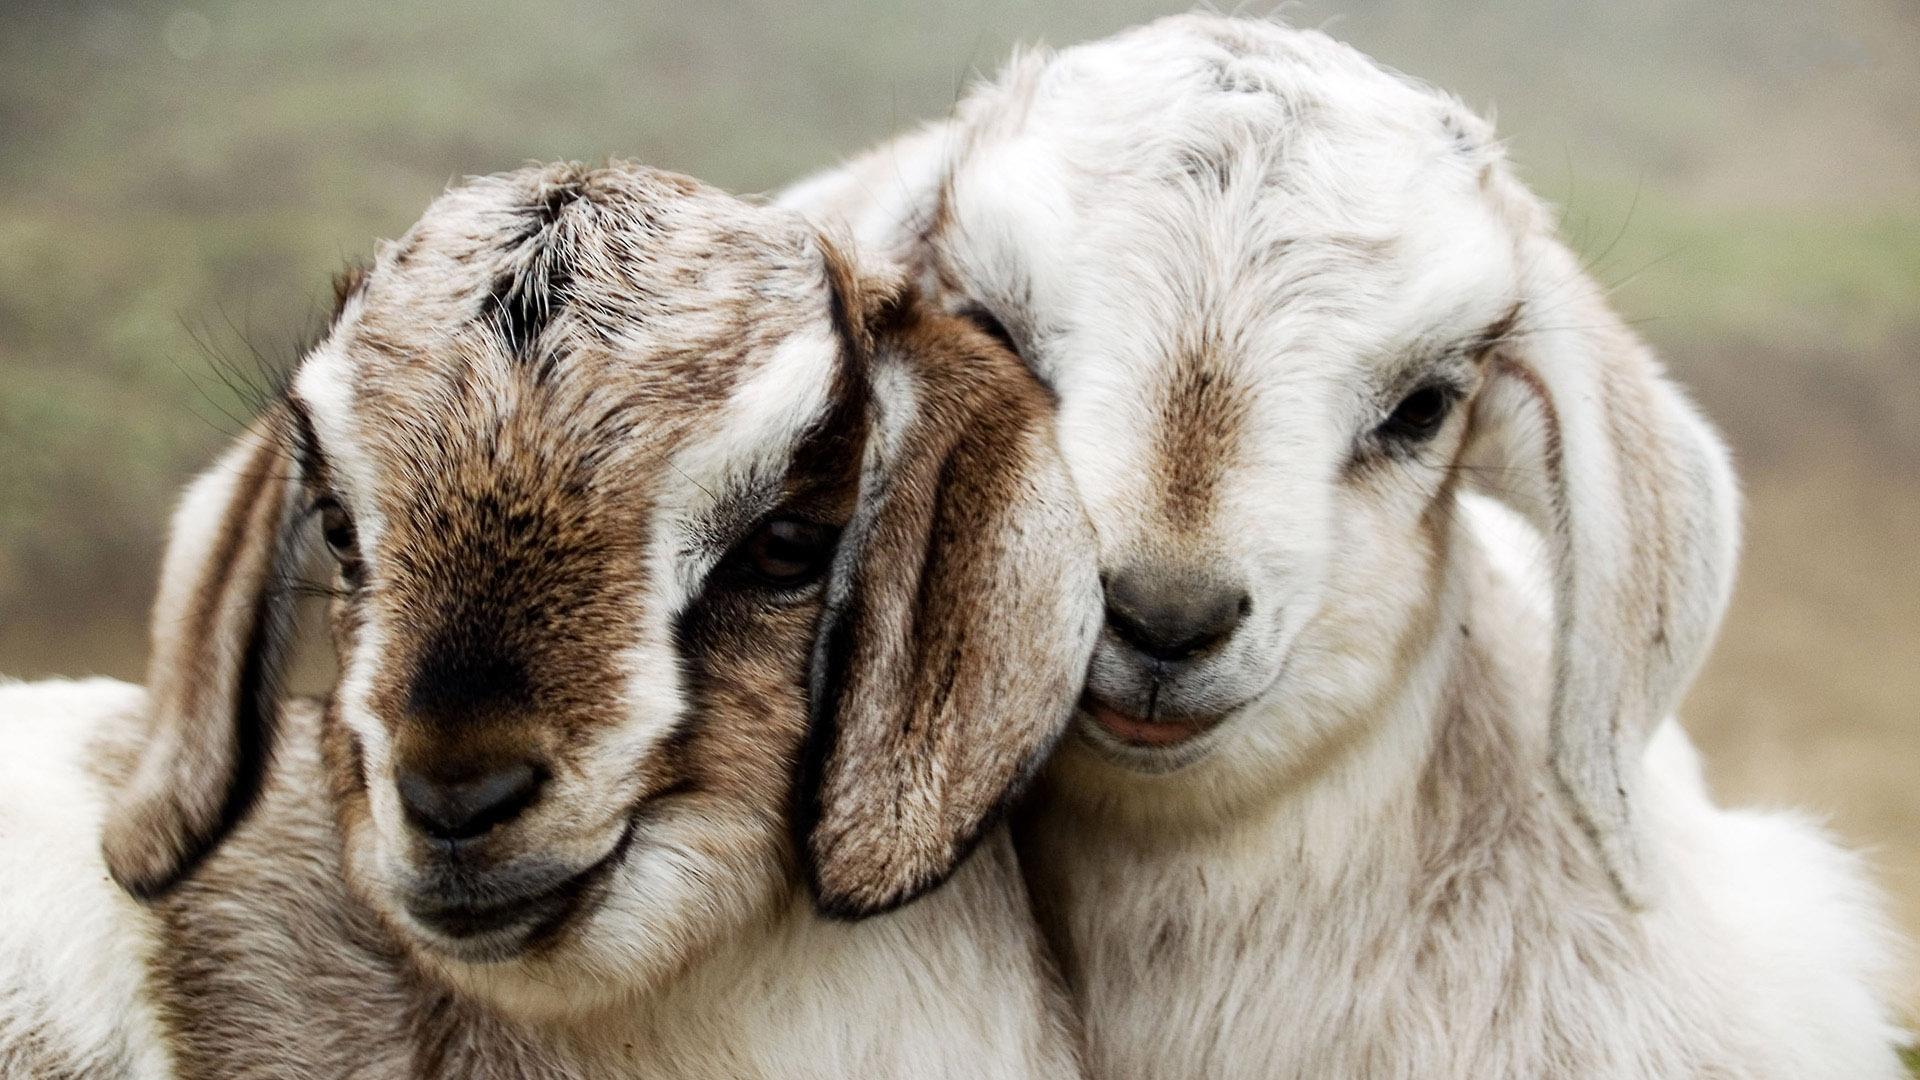 goat wallpaper hd